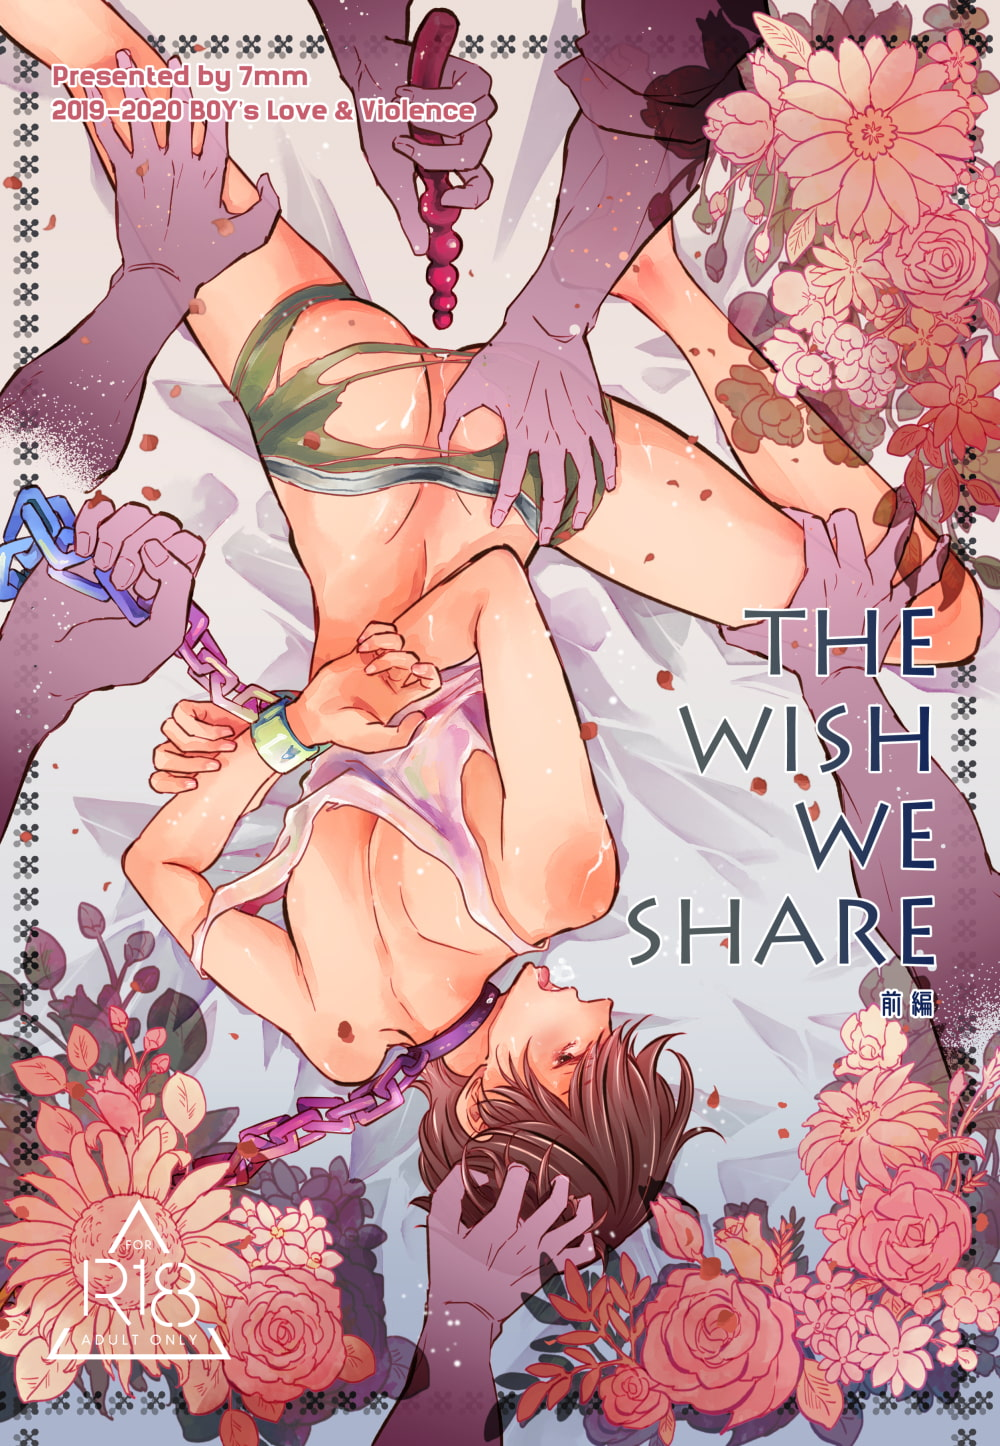 THE WISH WE SHARE 前編